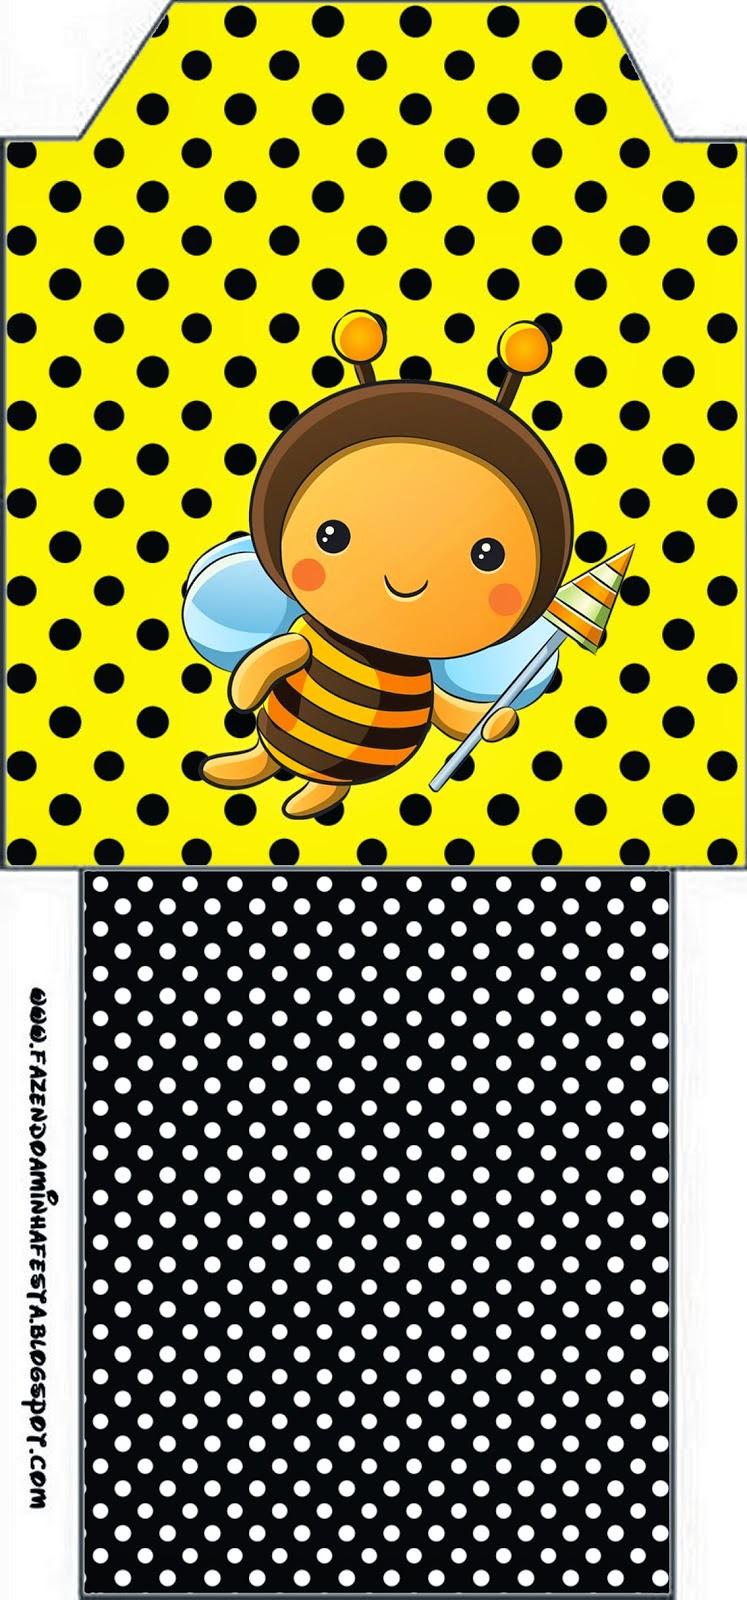 Bolsita de Té para imprimir gratis de Abejitas Bebé.